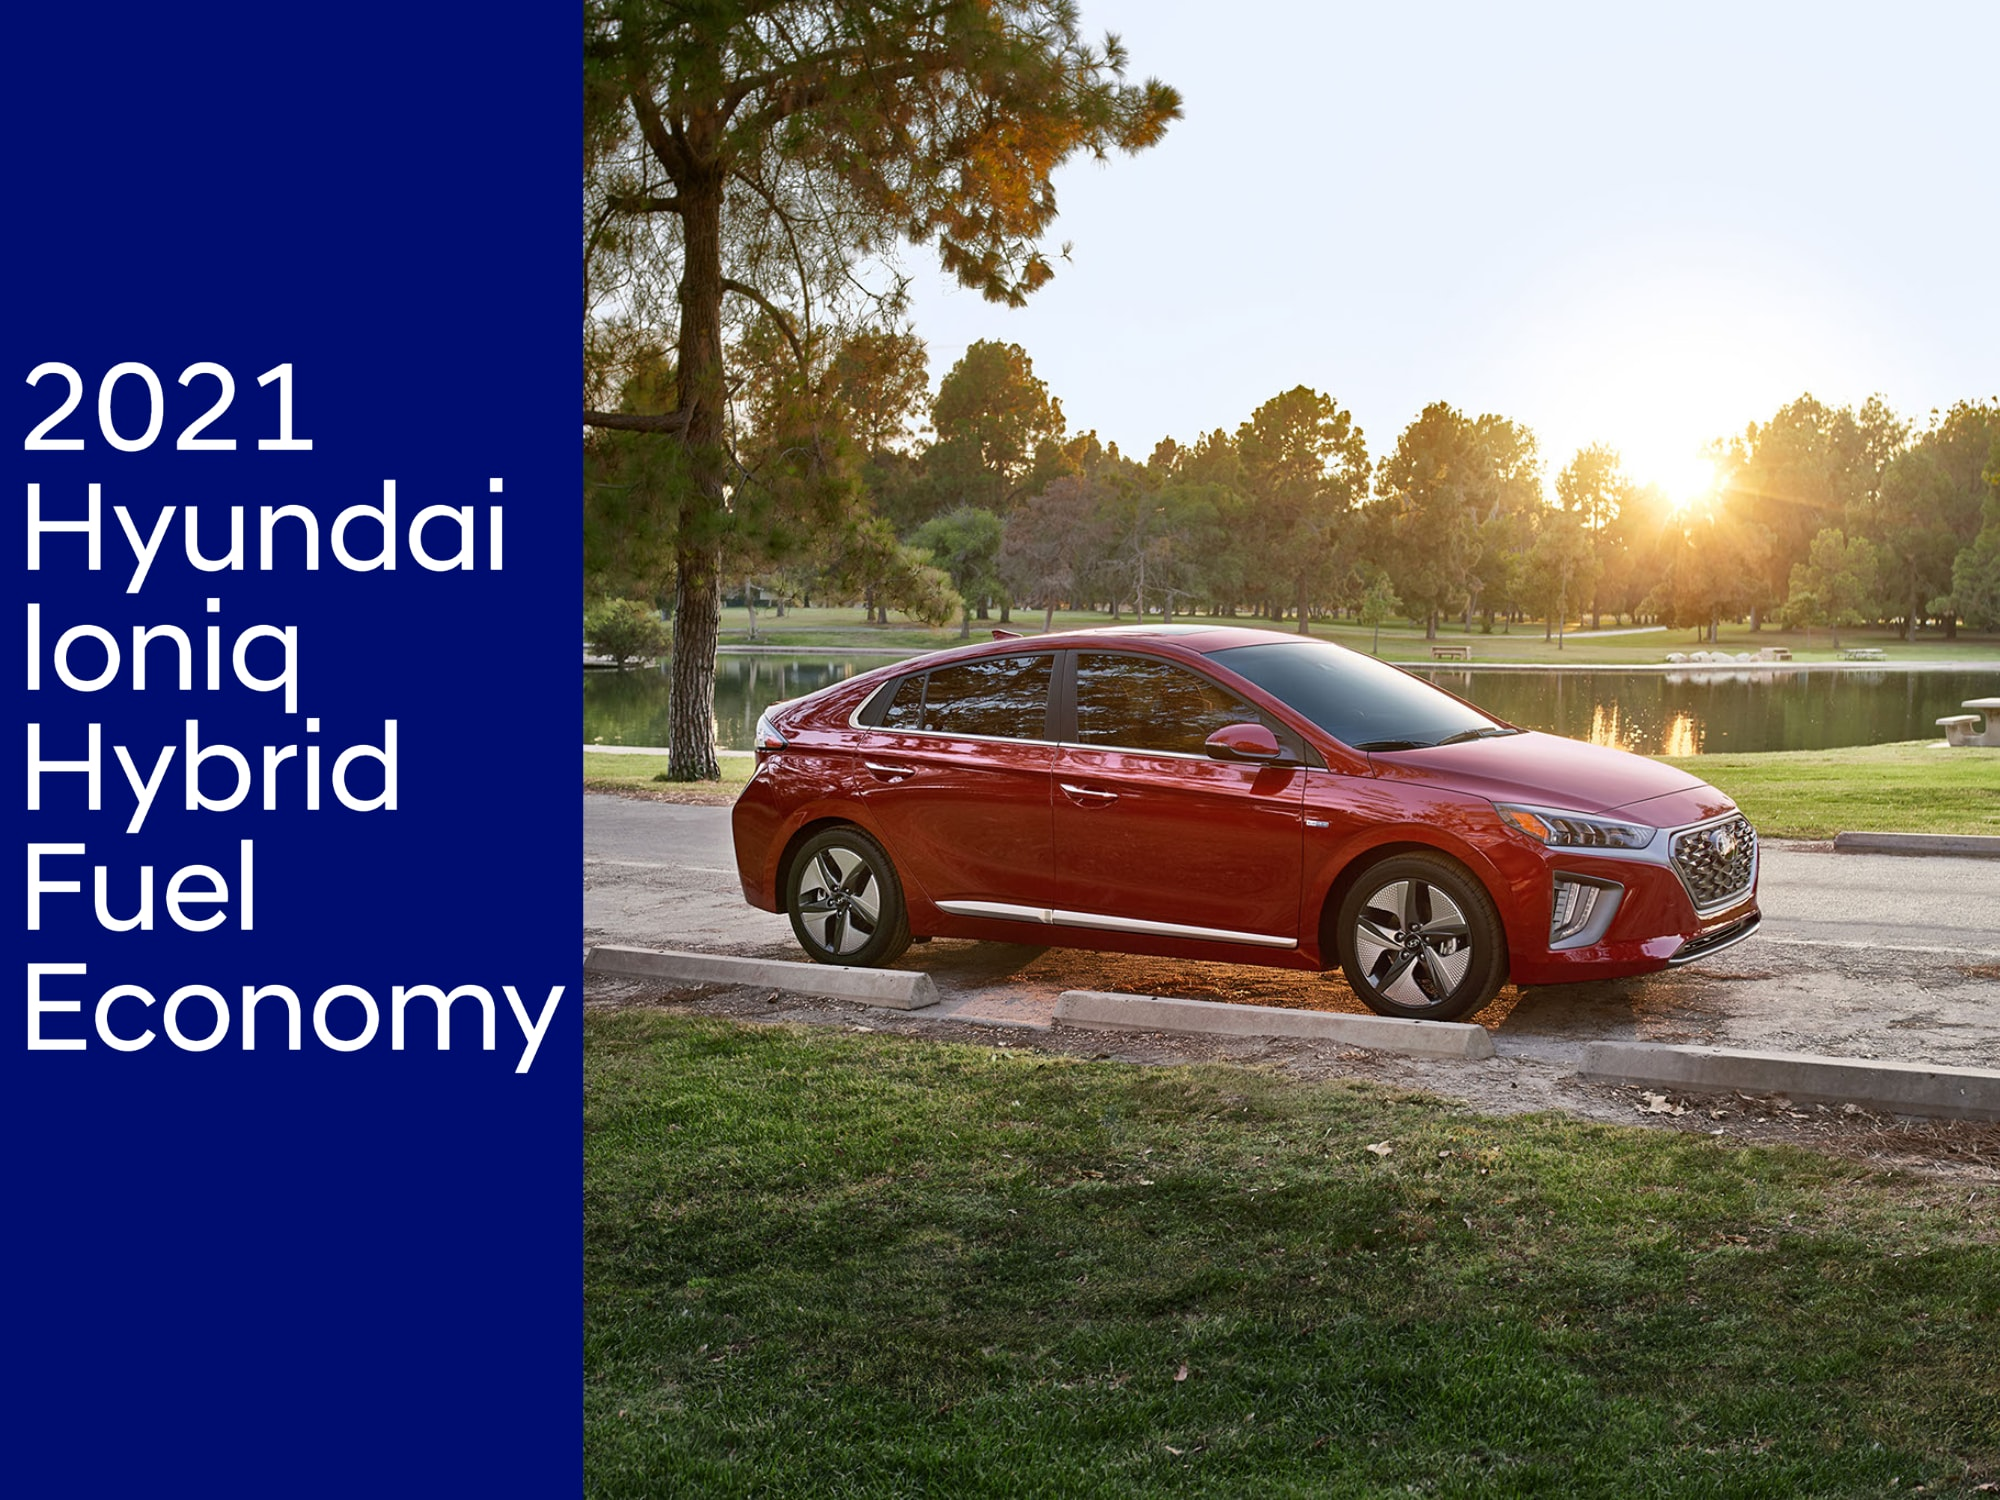 Front 3/4 view of new Hyundai Ioniq Hybrid